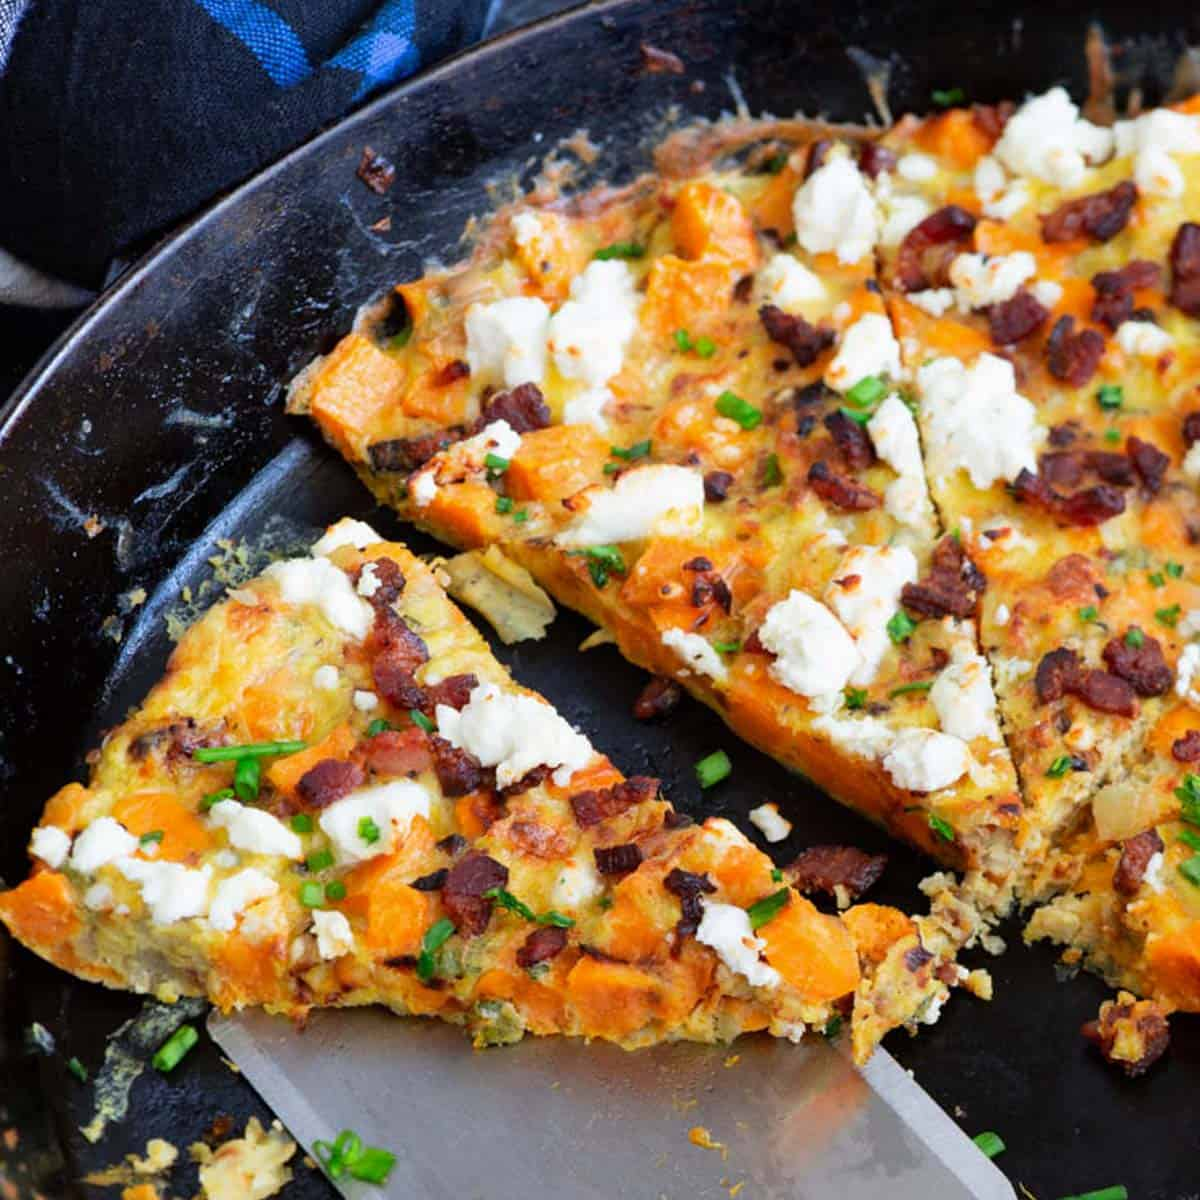 A slice of a sweet potato frittatta